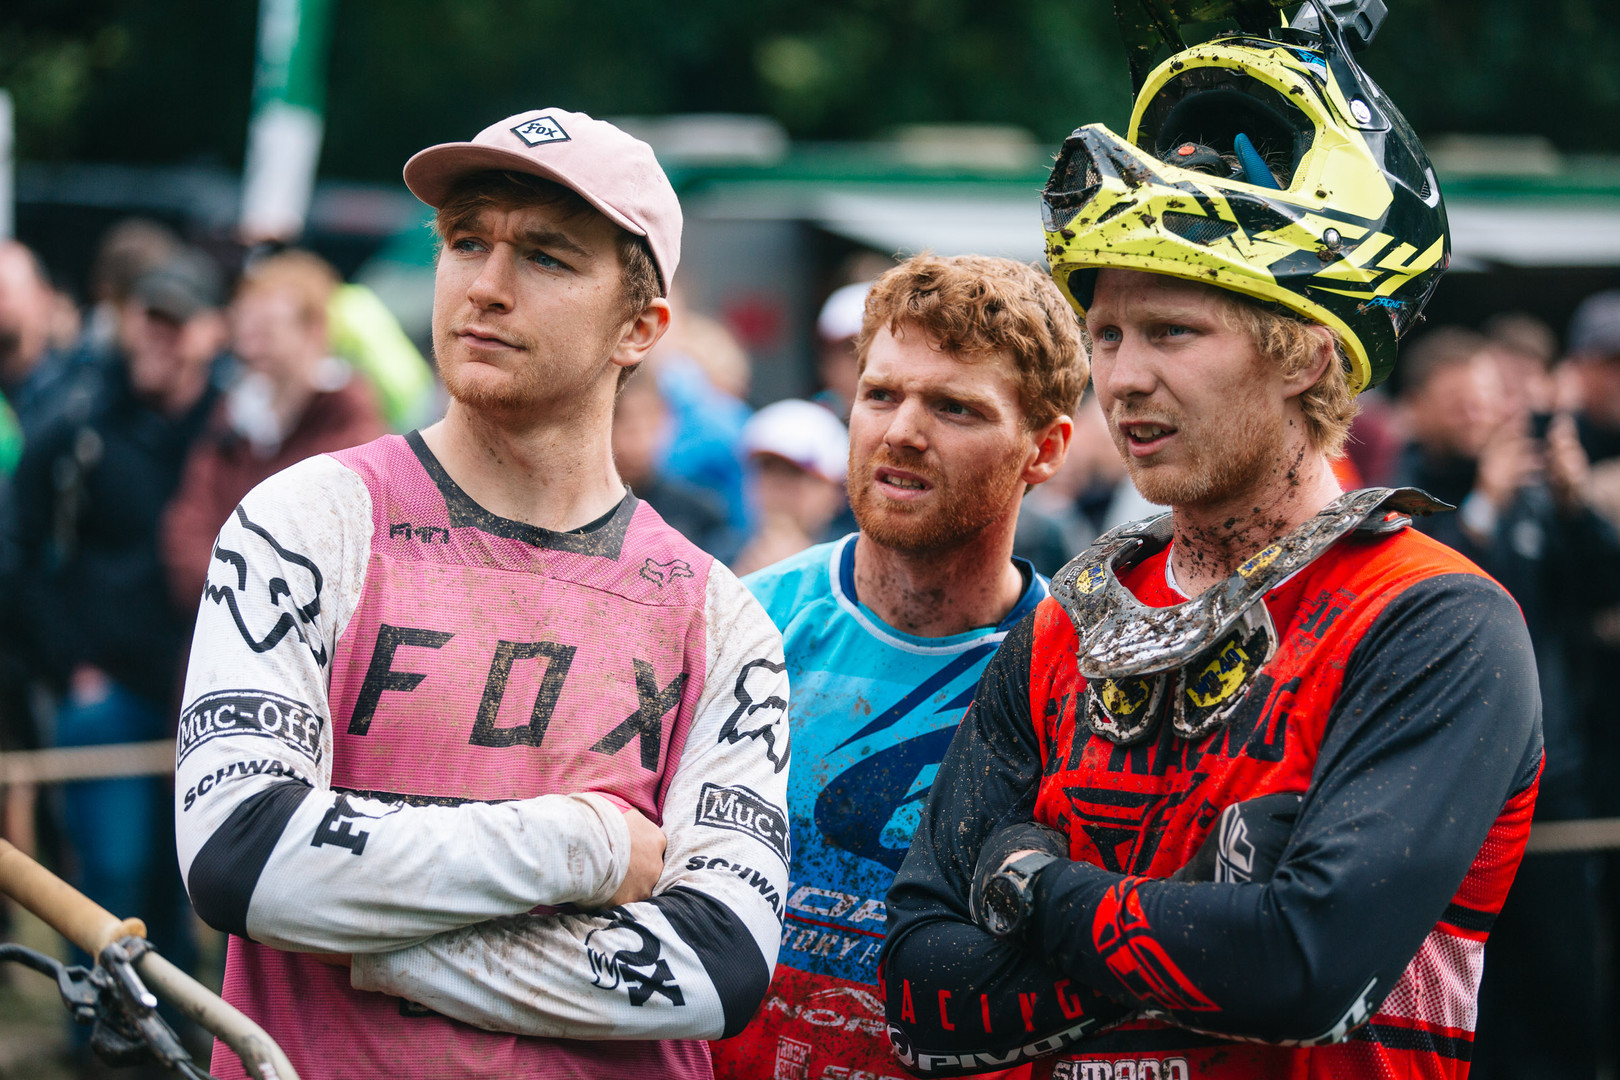 Kaos Seagrave, Joe Smith and Bernasrd Kerr at RedBull Hardline